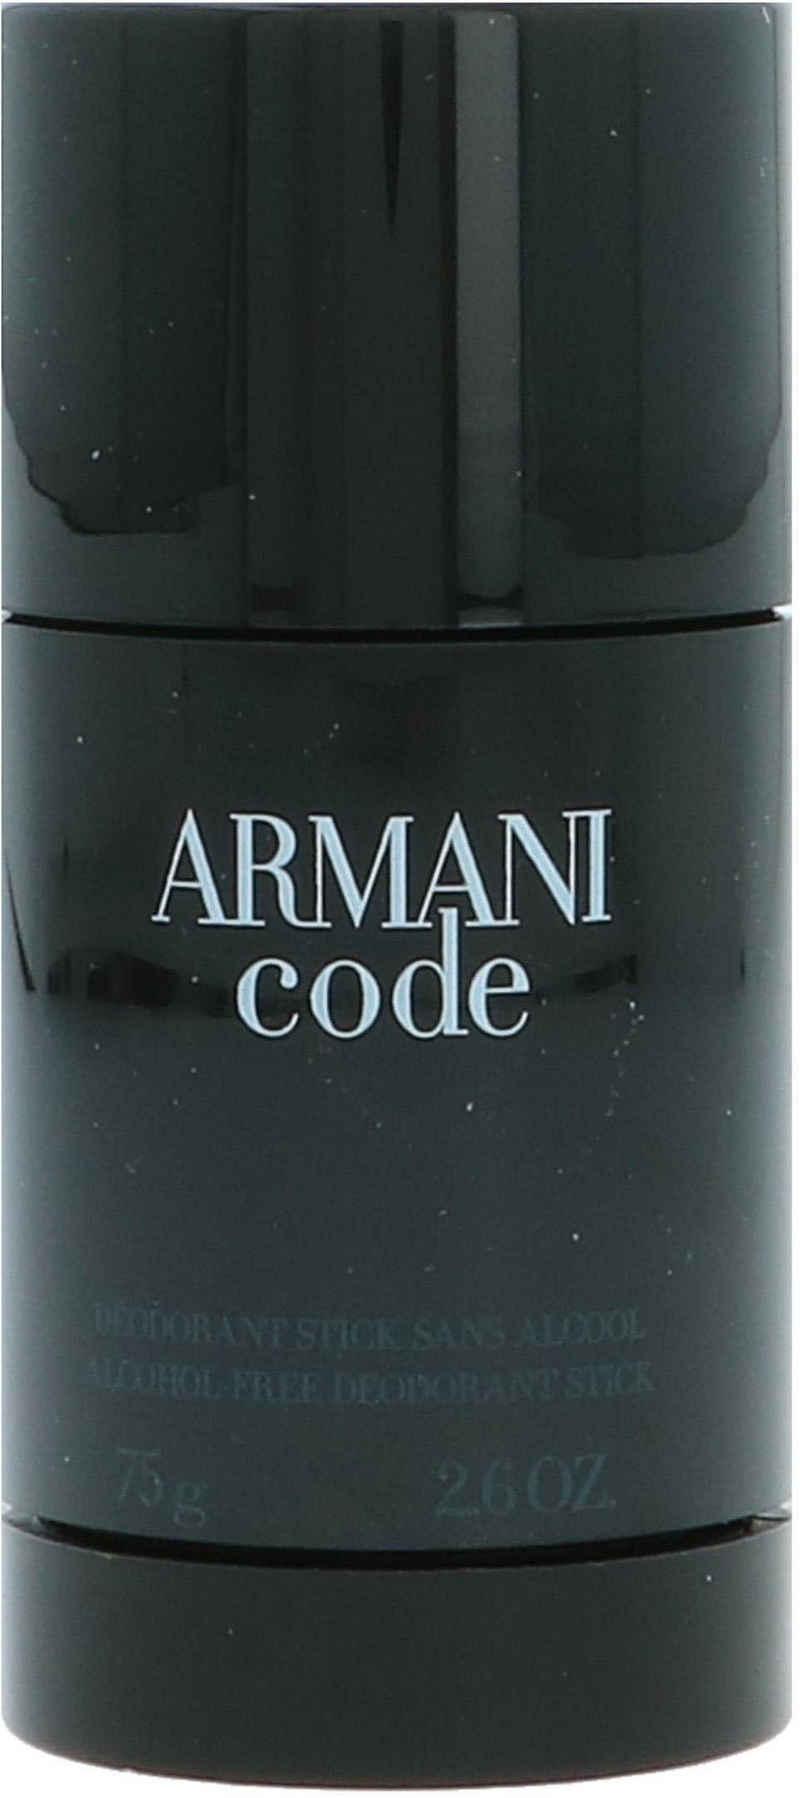 Giorgio Armani Deo-Stift »Code pour Homme«